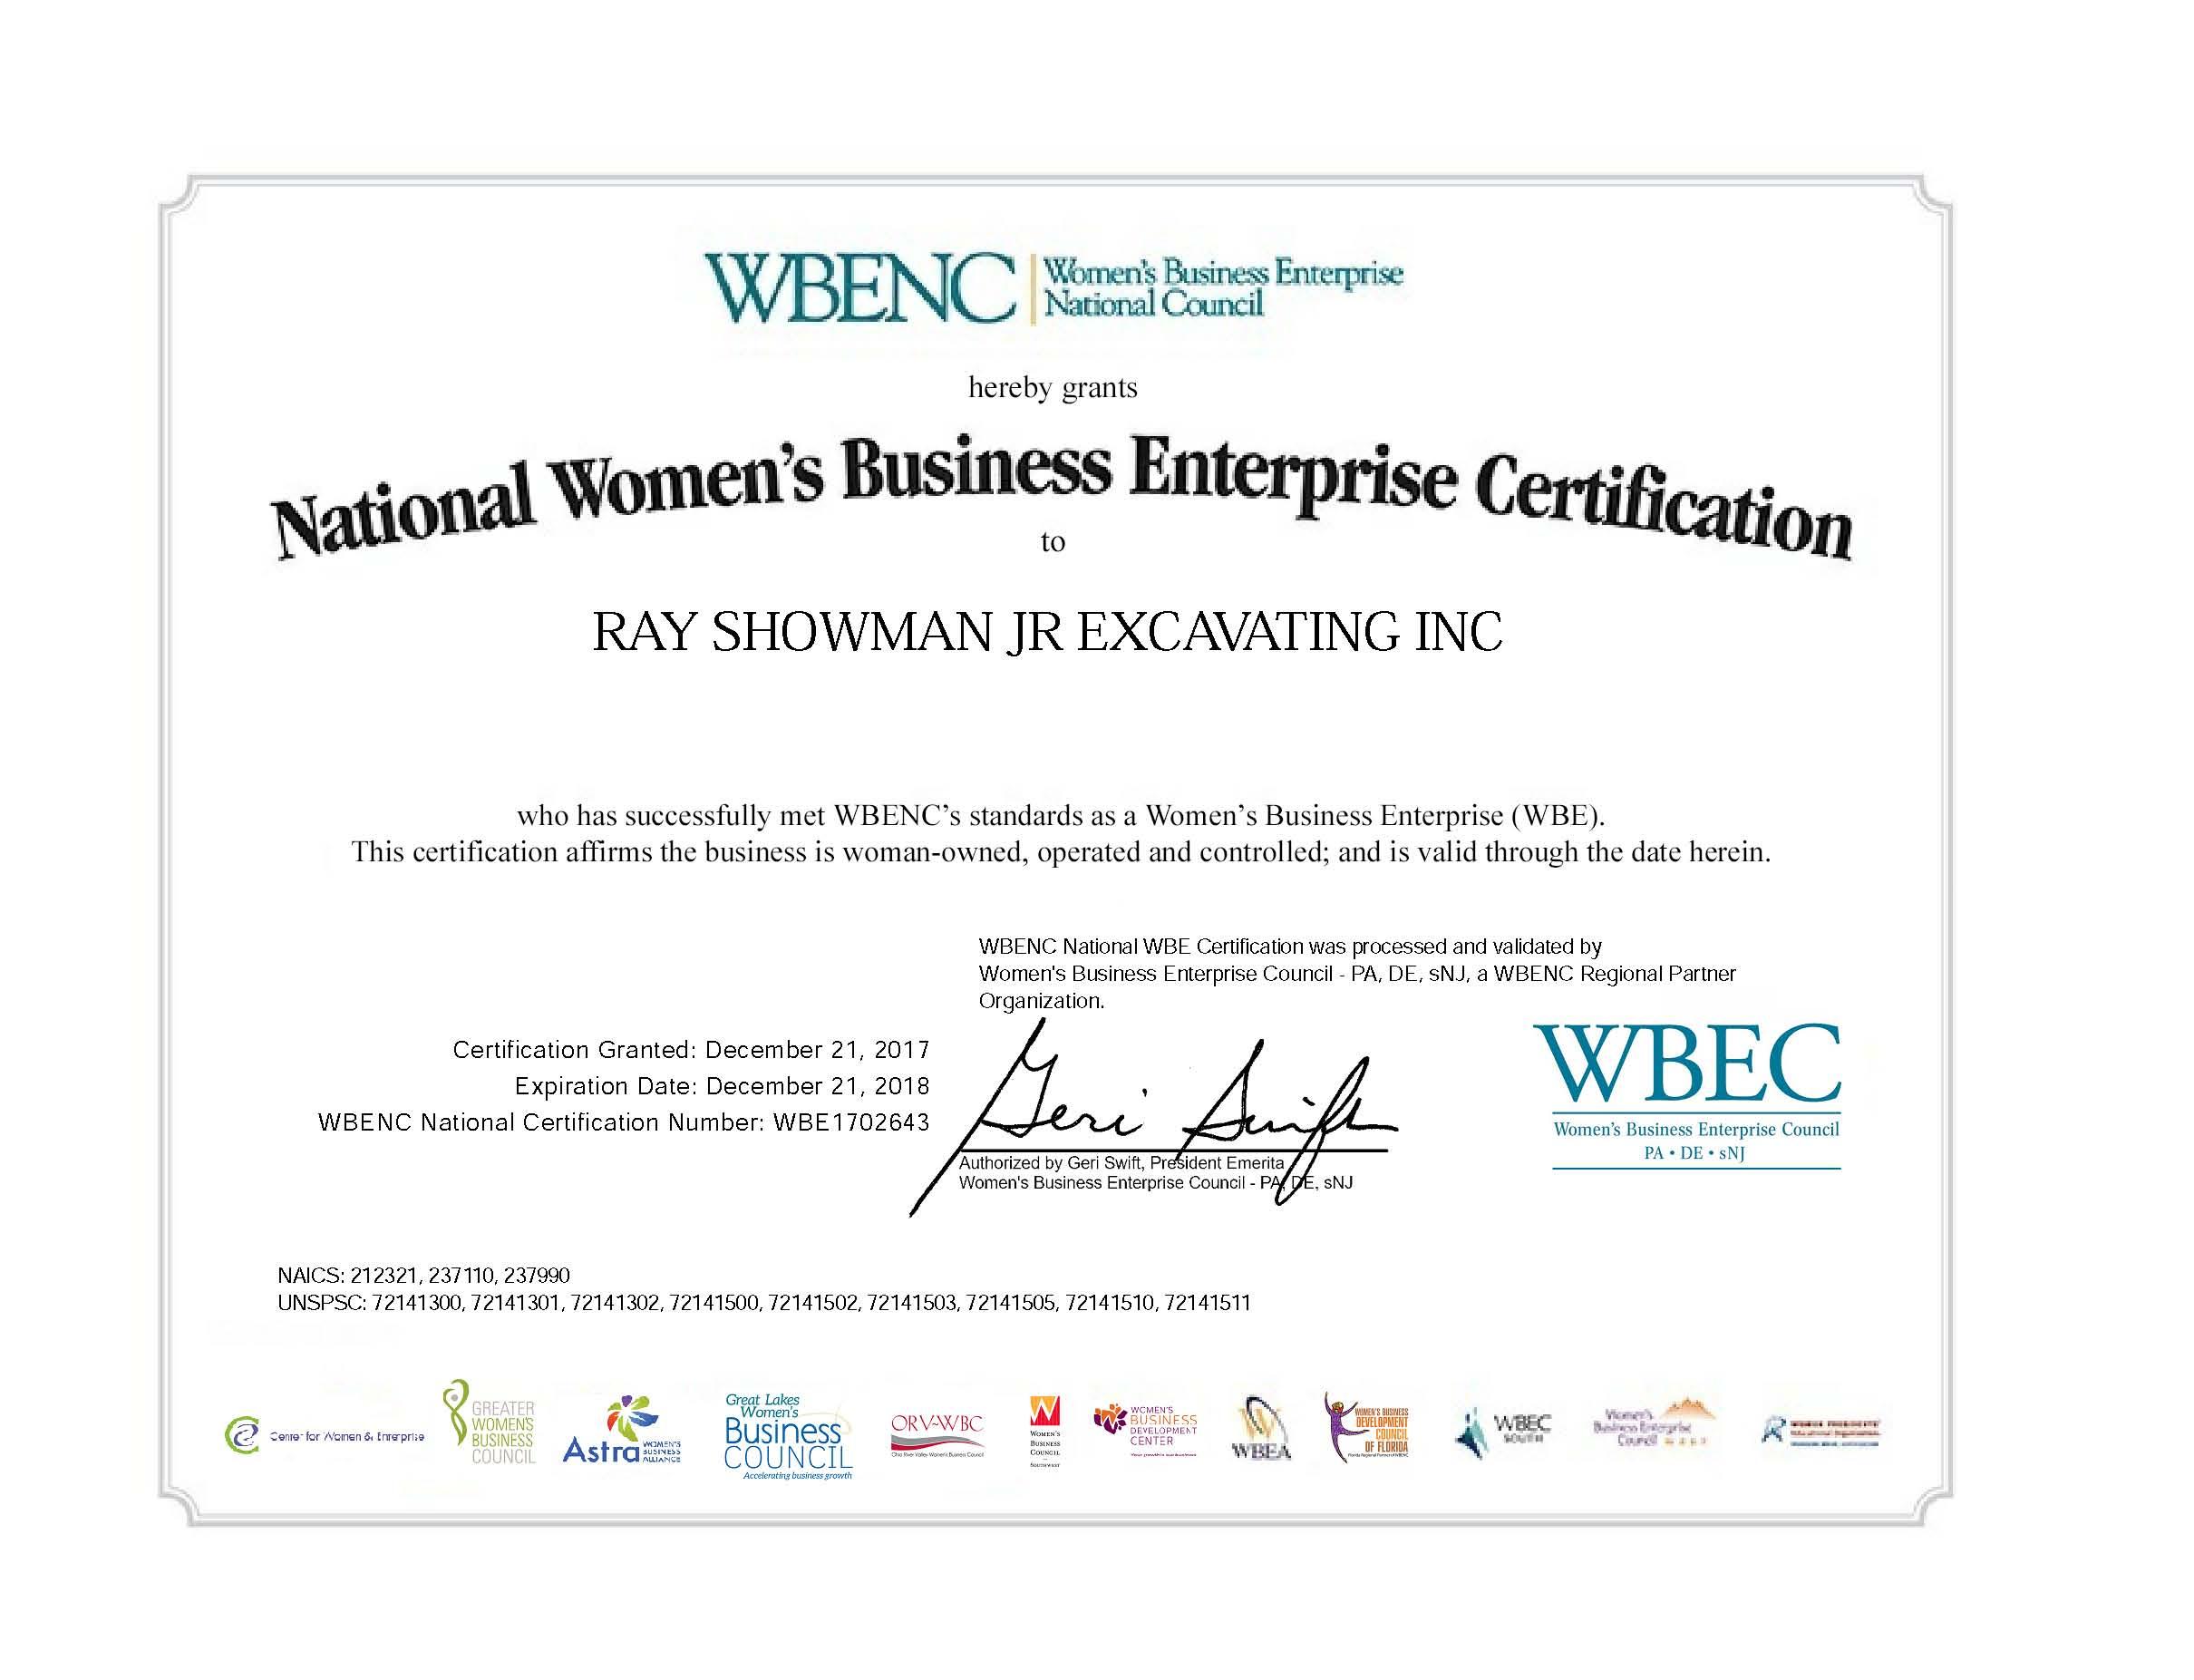 WBENC - WOSB Certificate